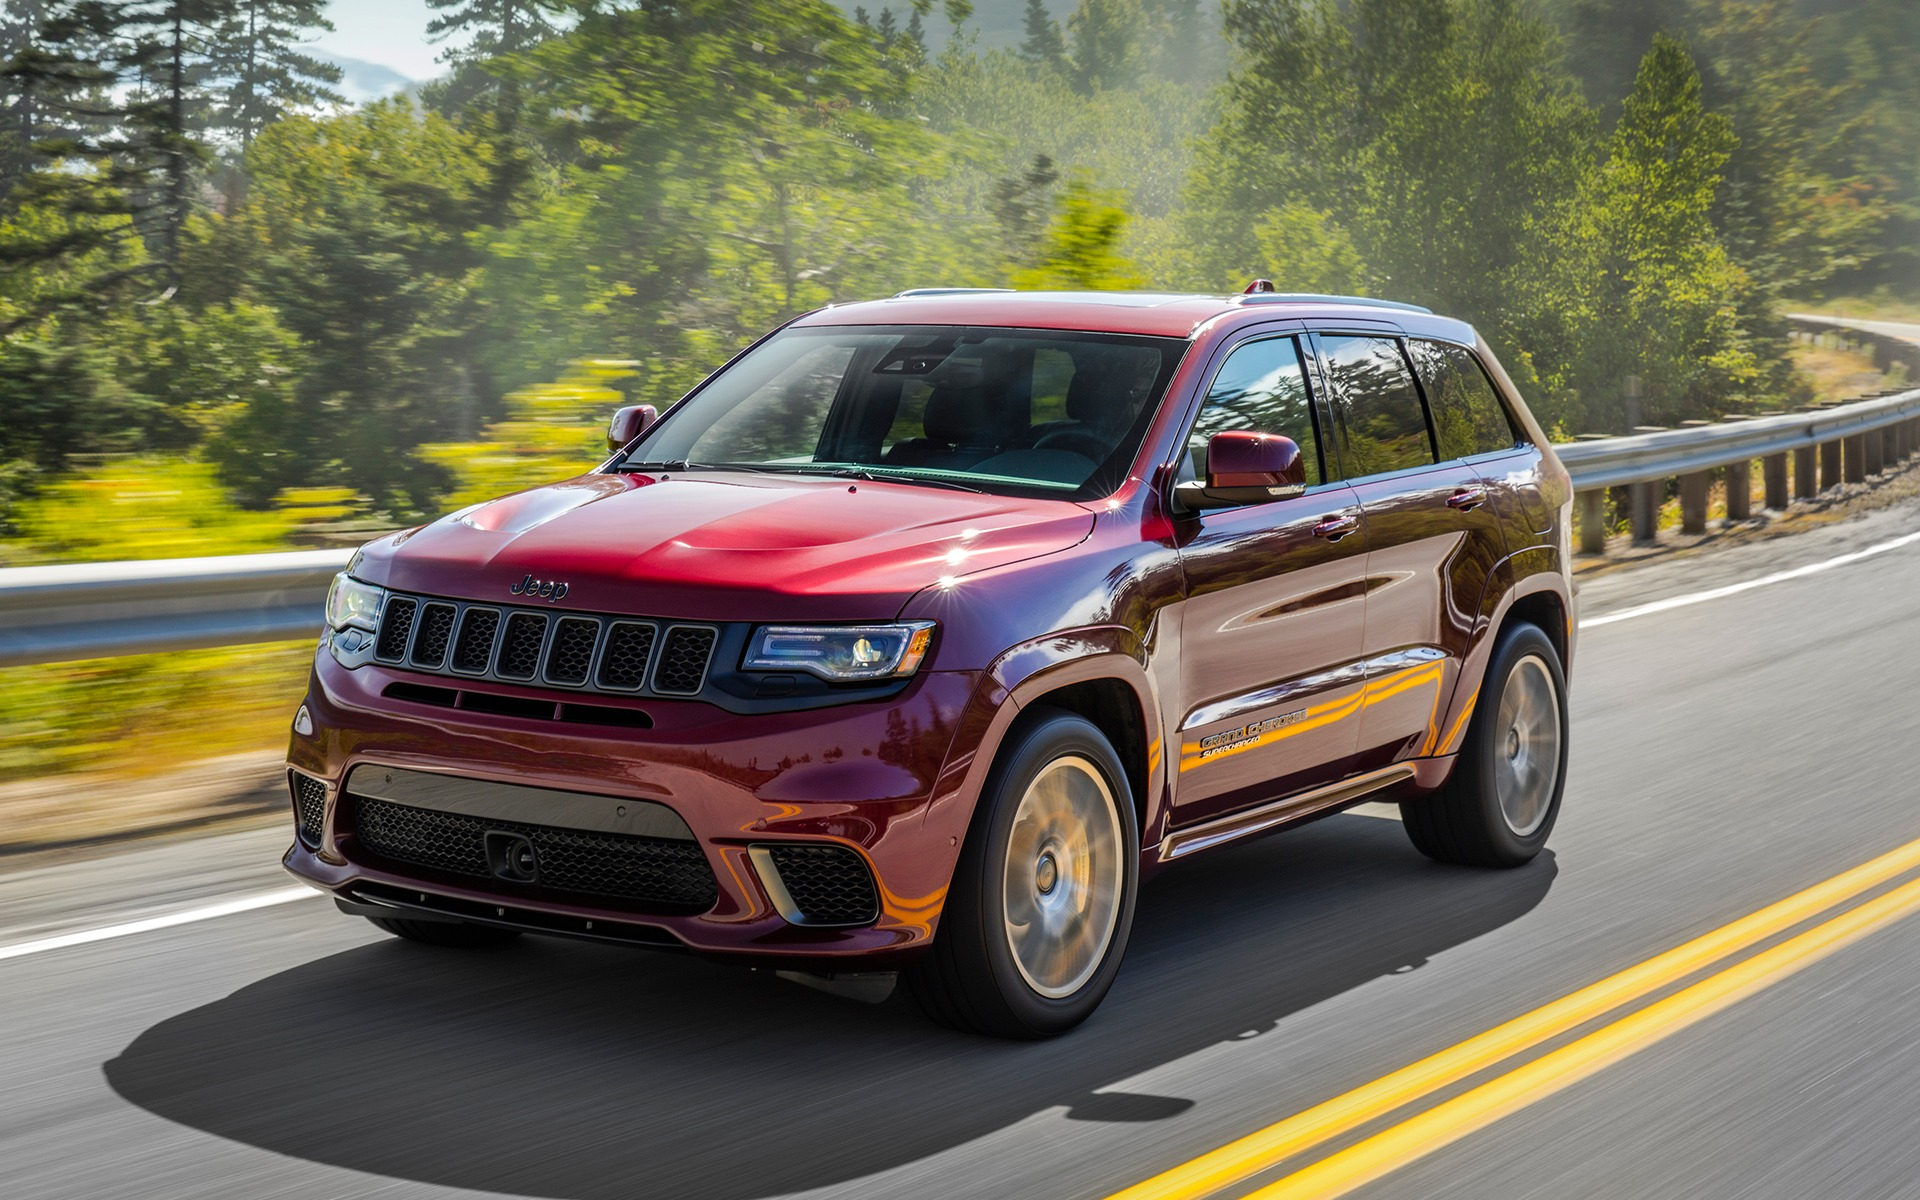 Jeep Trackhawk 2018 >> Le fougueux Jeep Grand Cherokee Trackhawk 2018 - 34/76